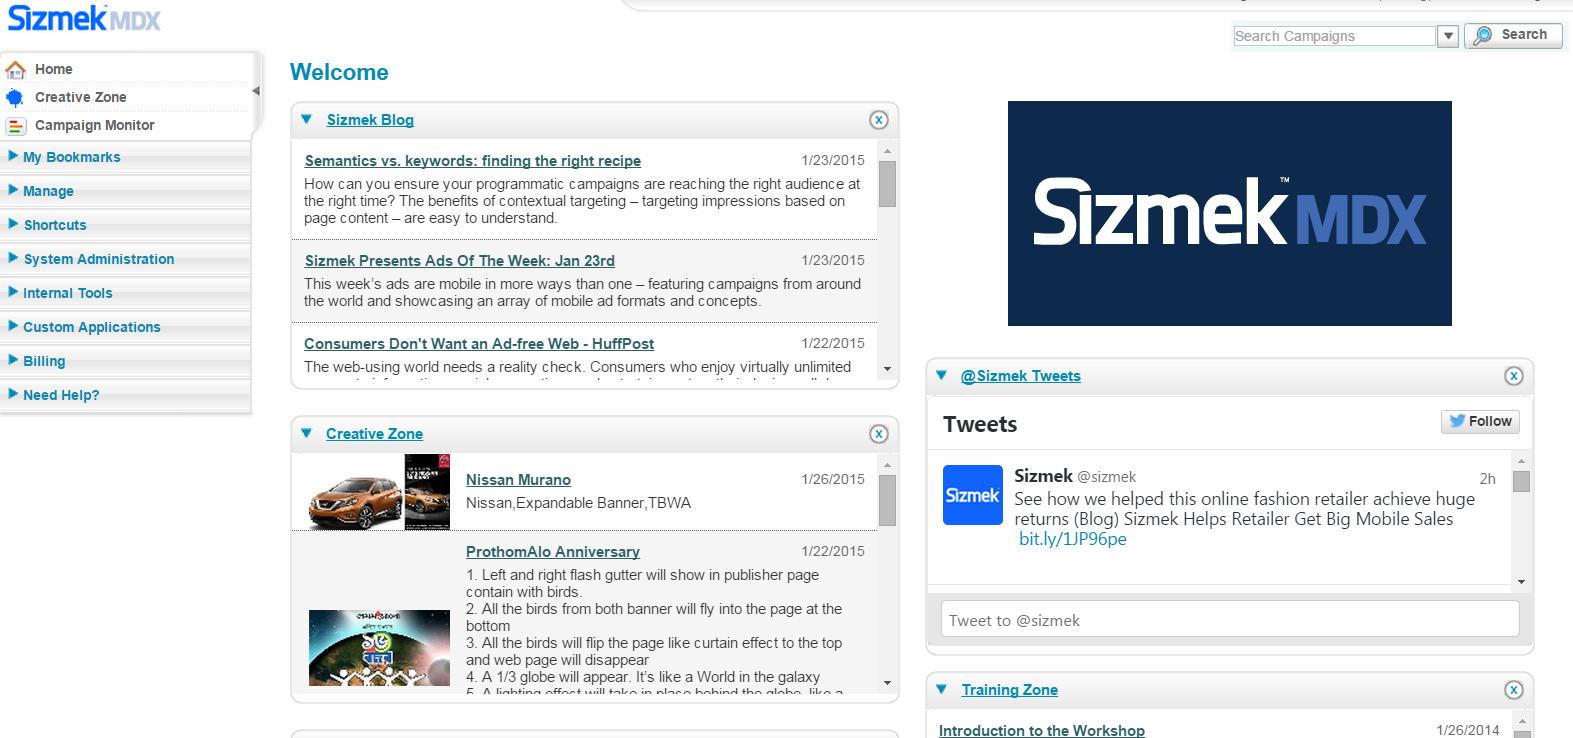 Sizmek Demo - Sizmek MDX Platform Homepage